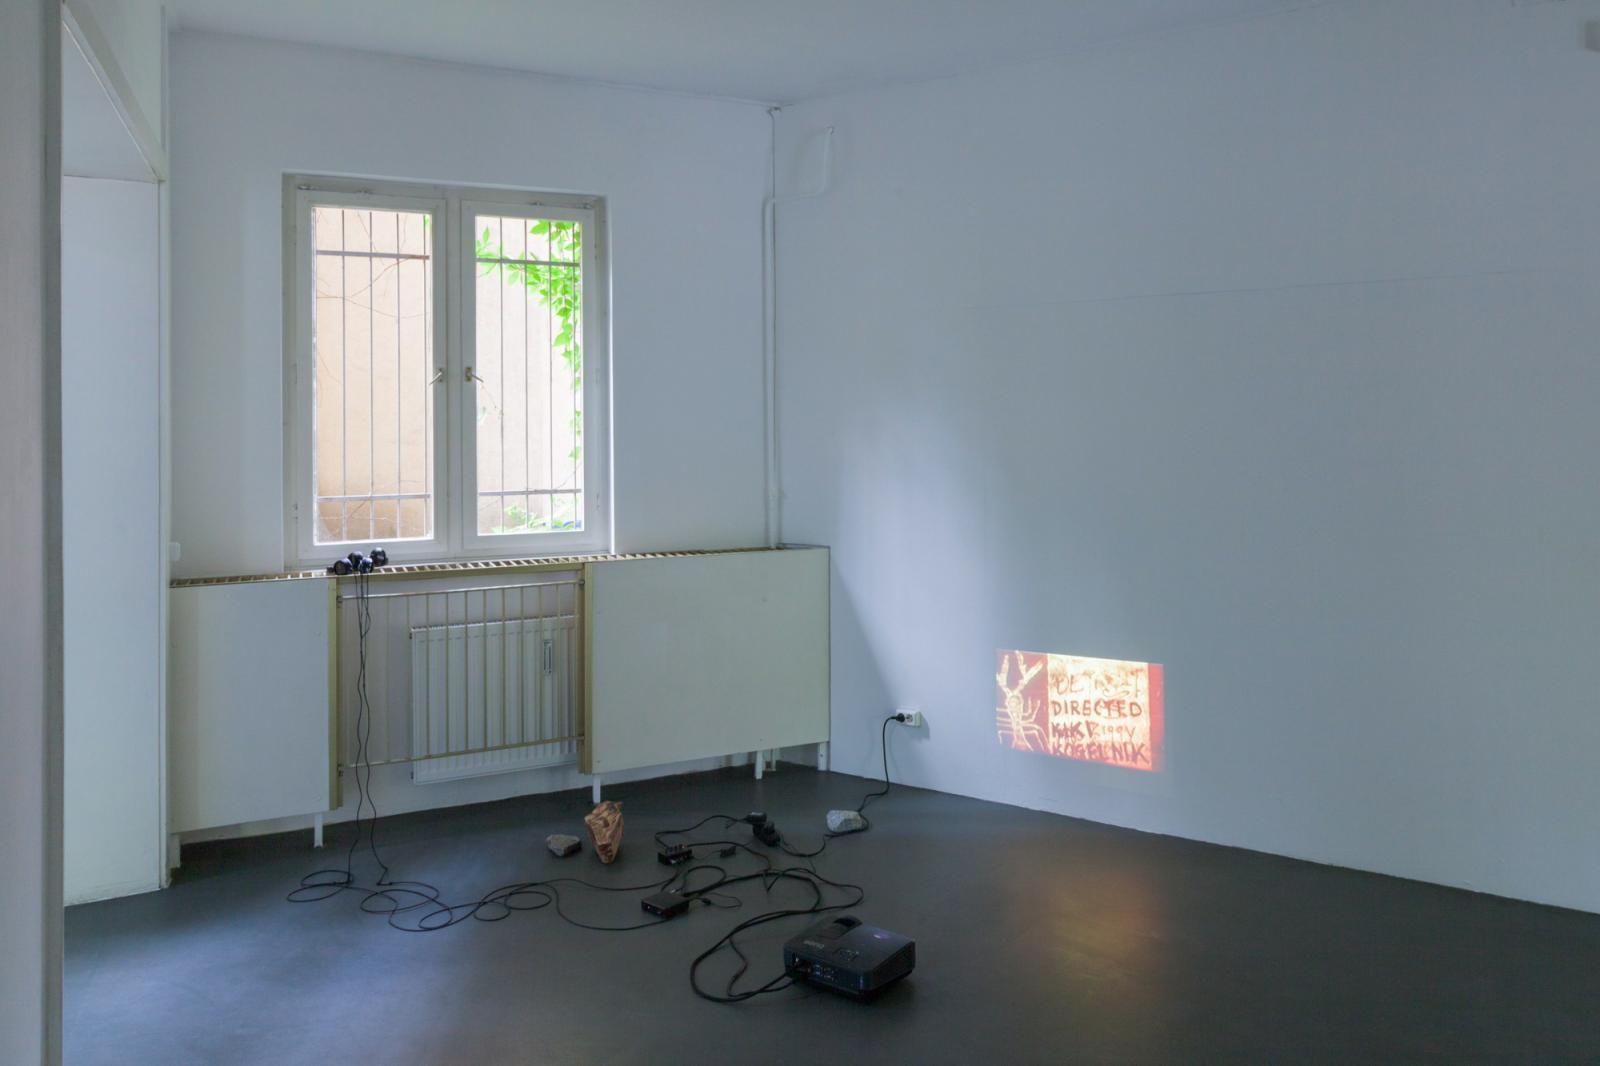 Installation view Kiki Kogelnik